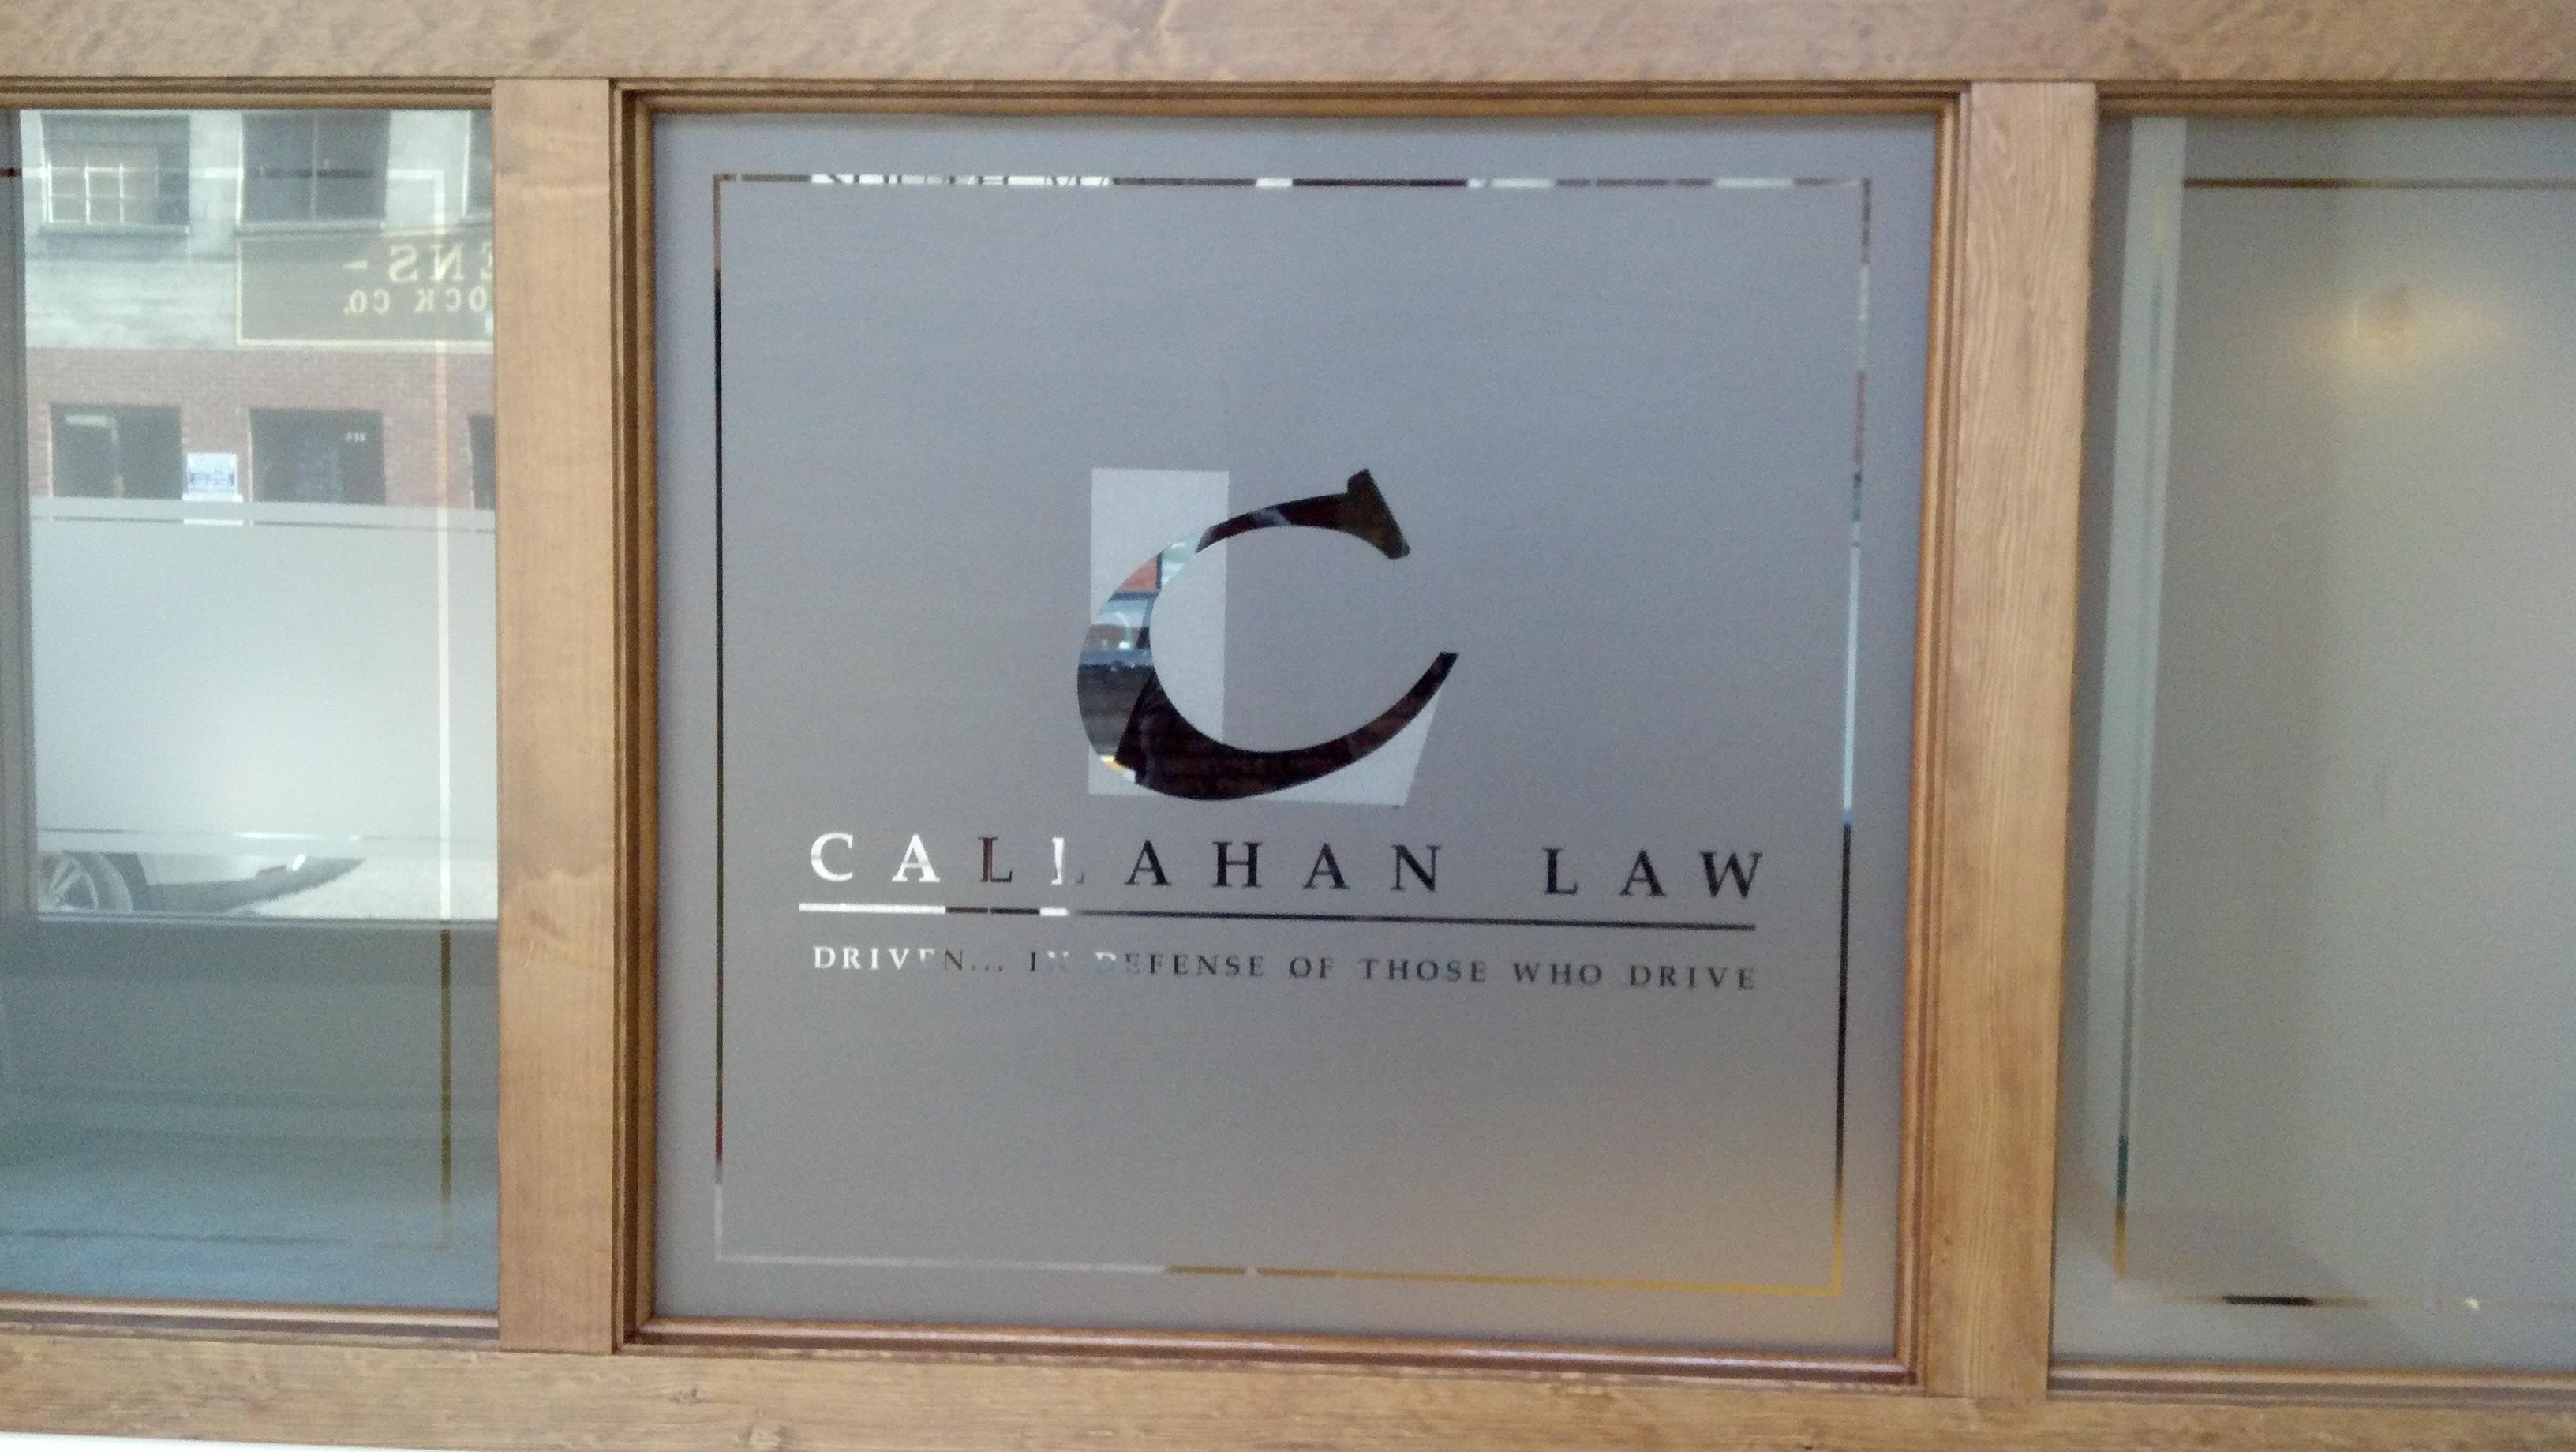 callahan law logo custom cut in decorative film - Decorative Films